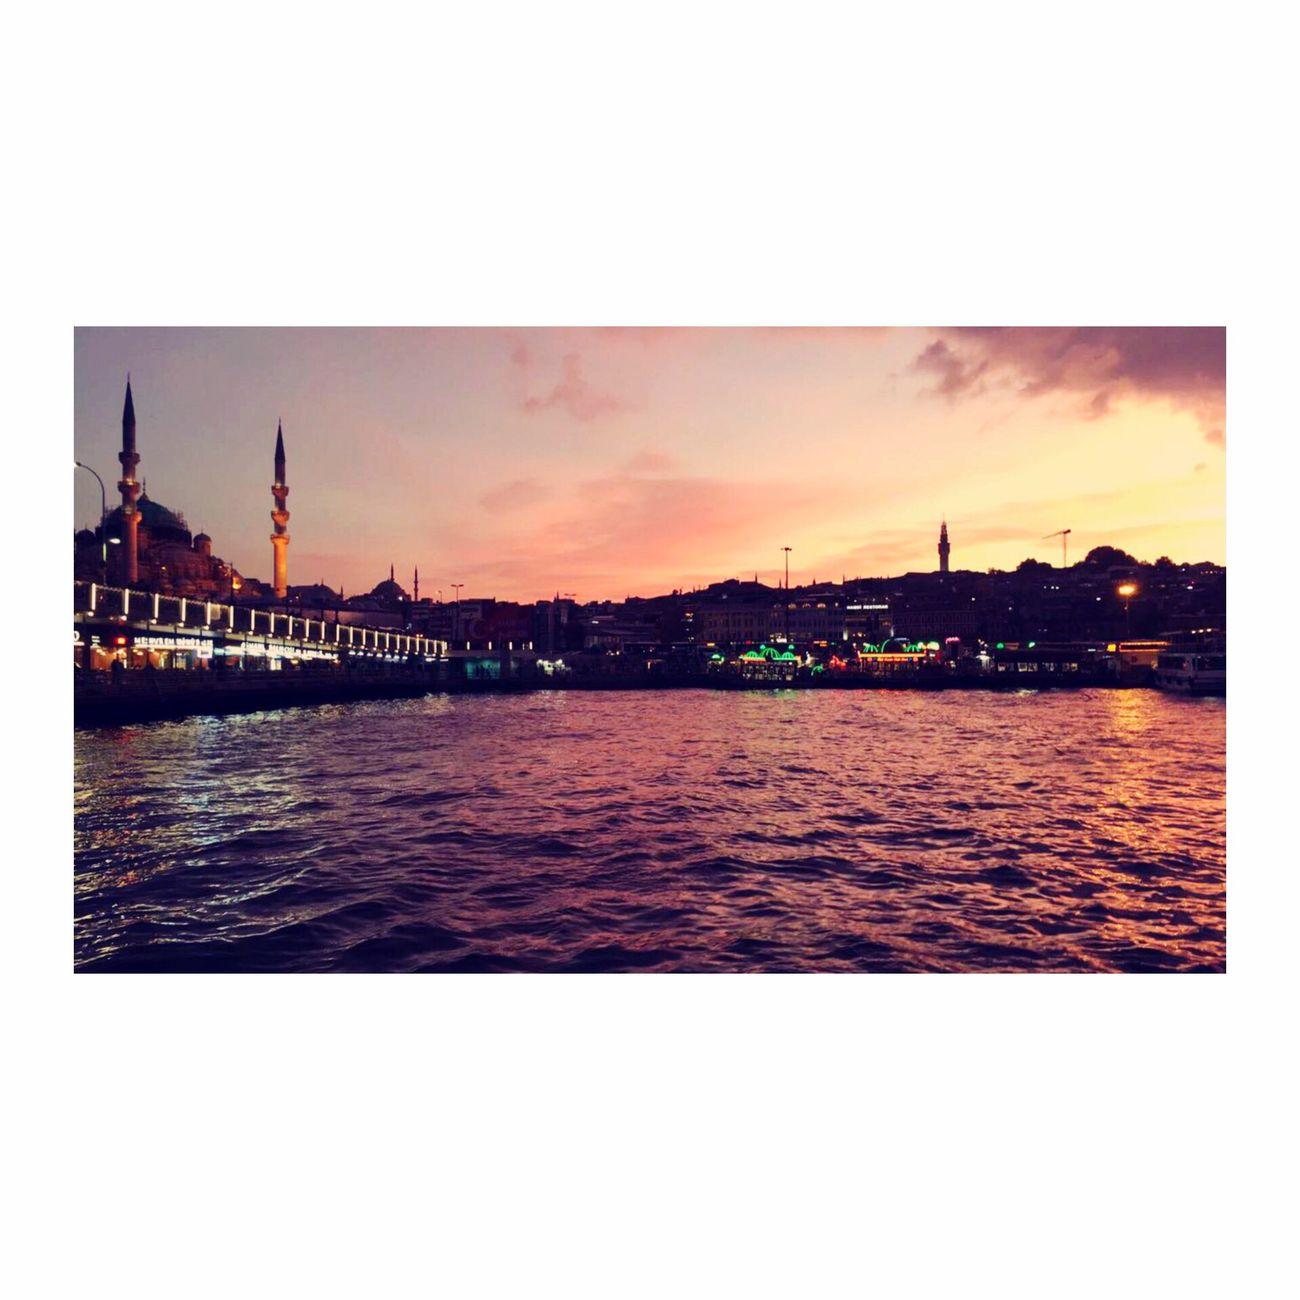 Istanbul Turkey Eminönü/ İstanbul Marmarasea Mosque Turkey Nightphotography Night Sky